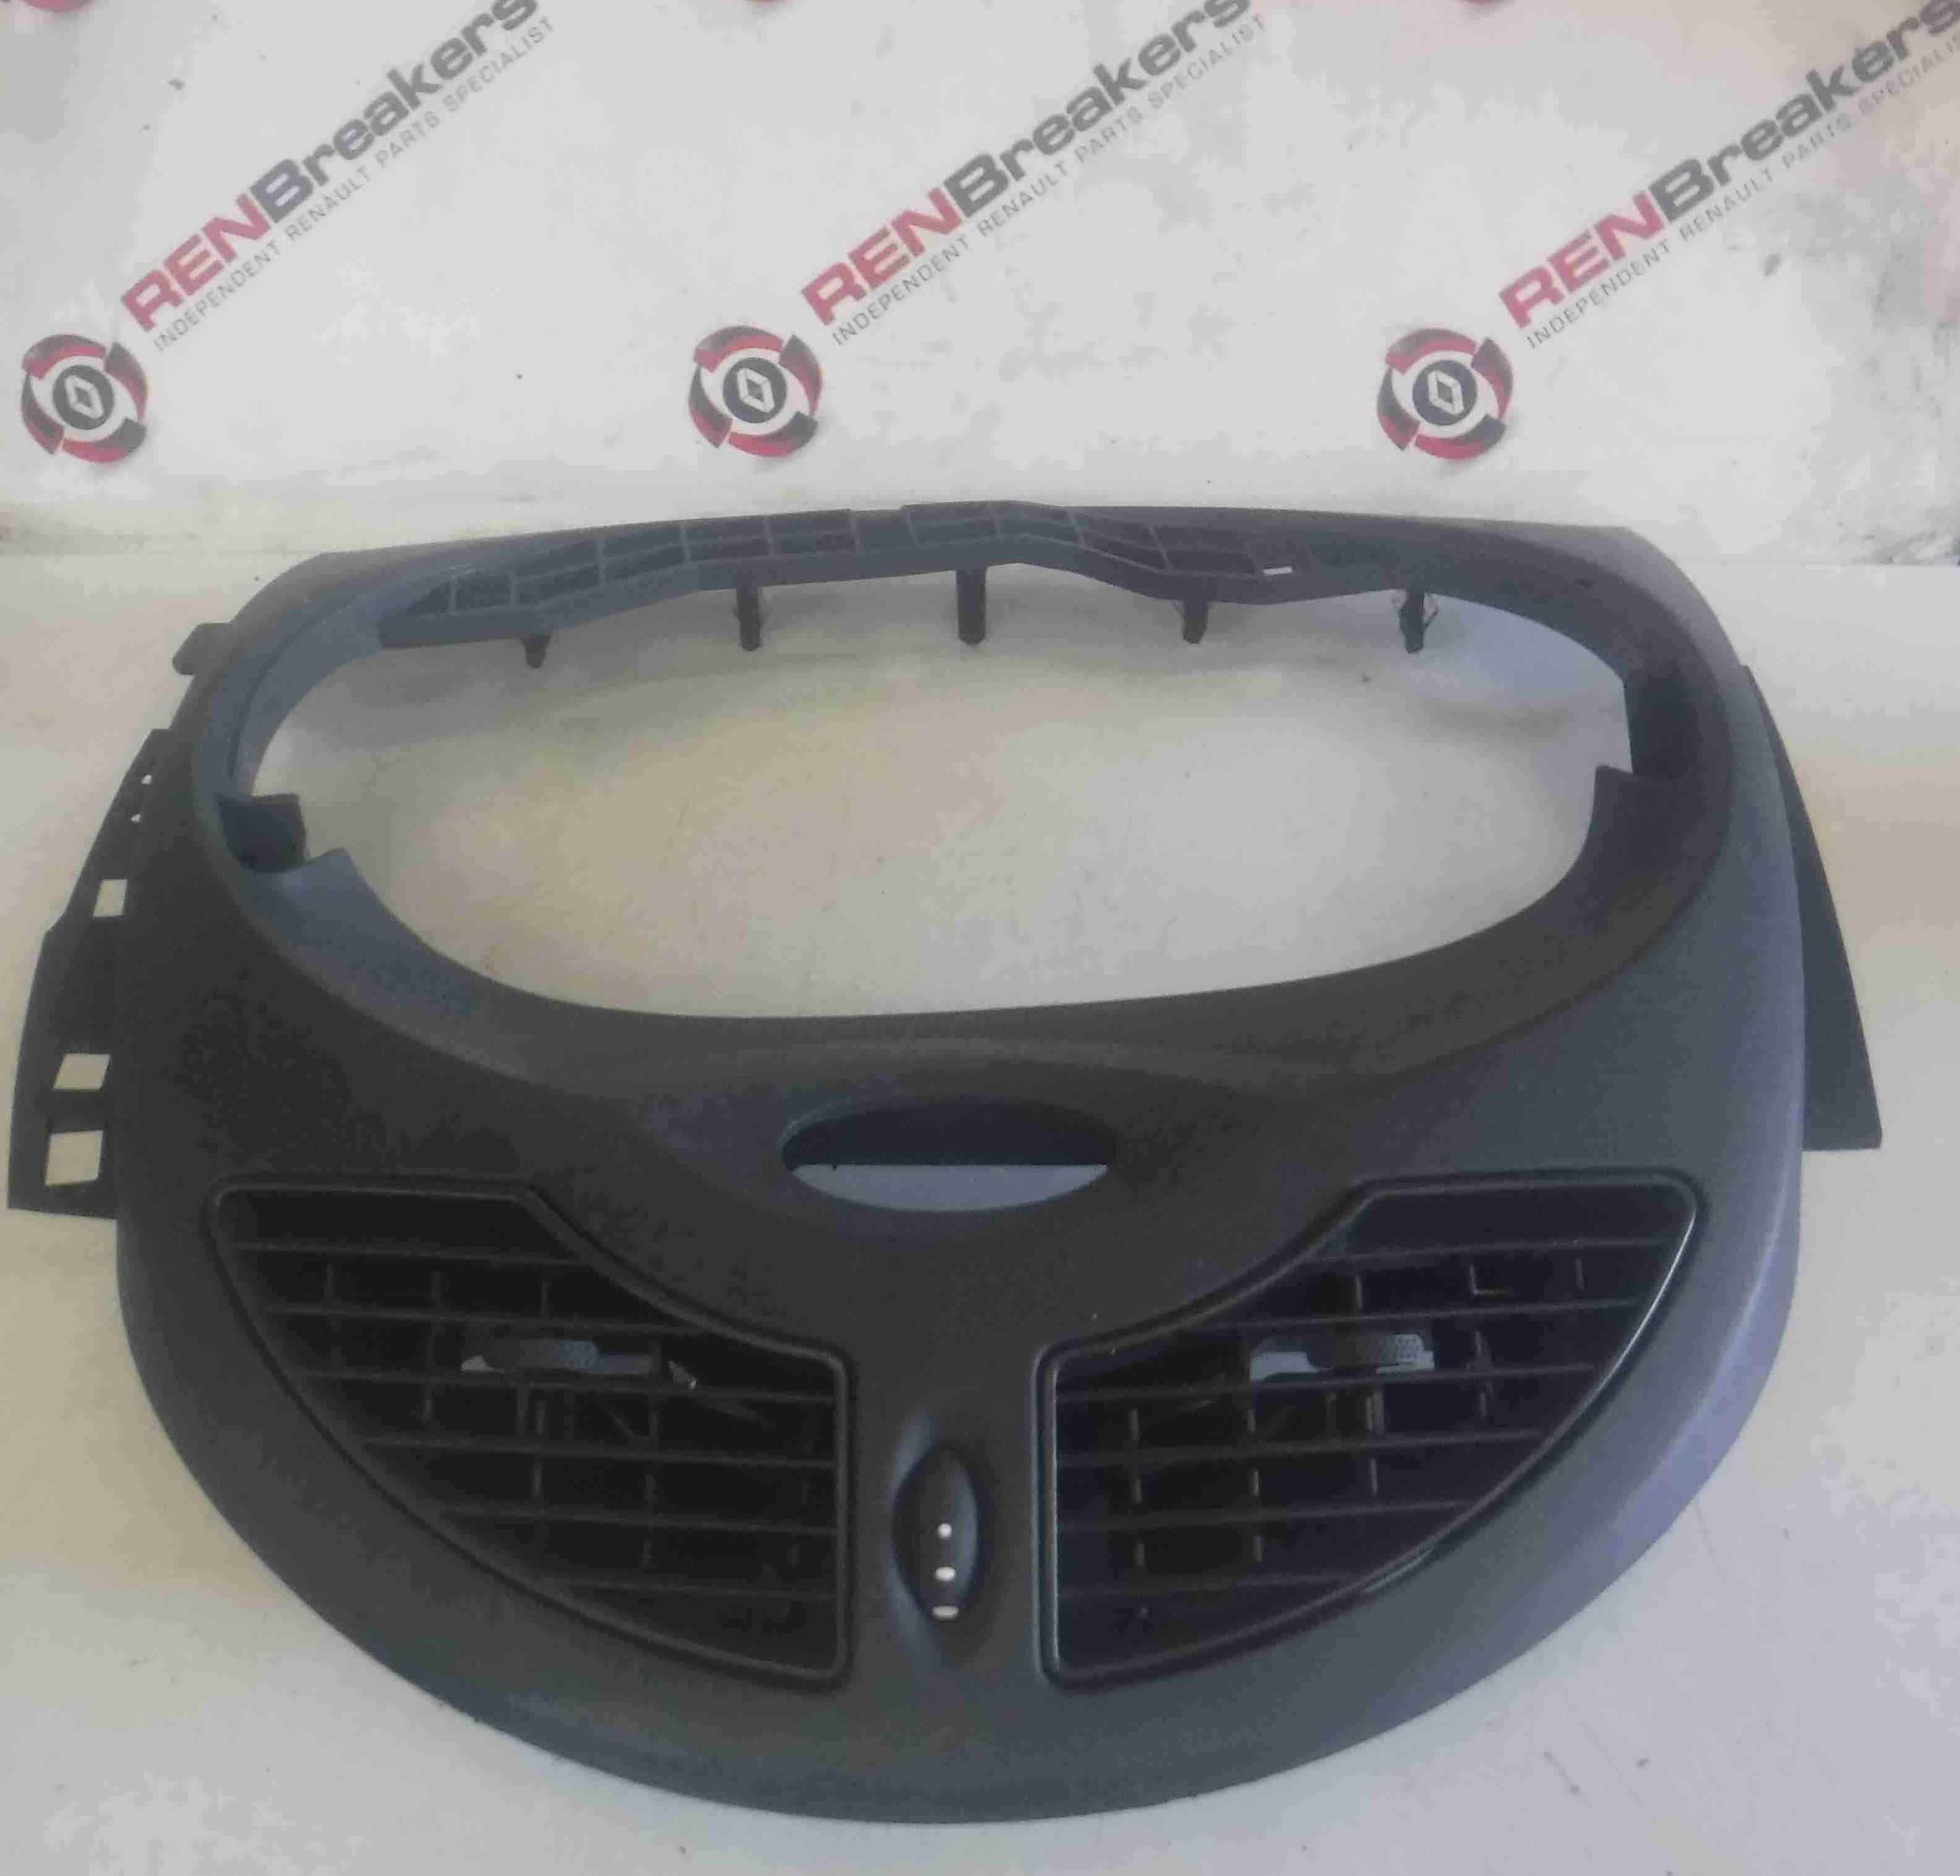 Renault Twingo 2011-2014 Centre Heater Vents Surround 8200457743